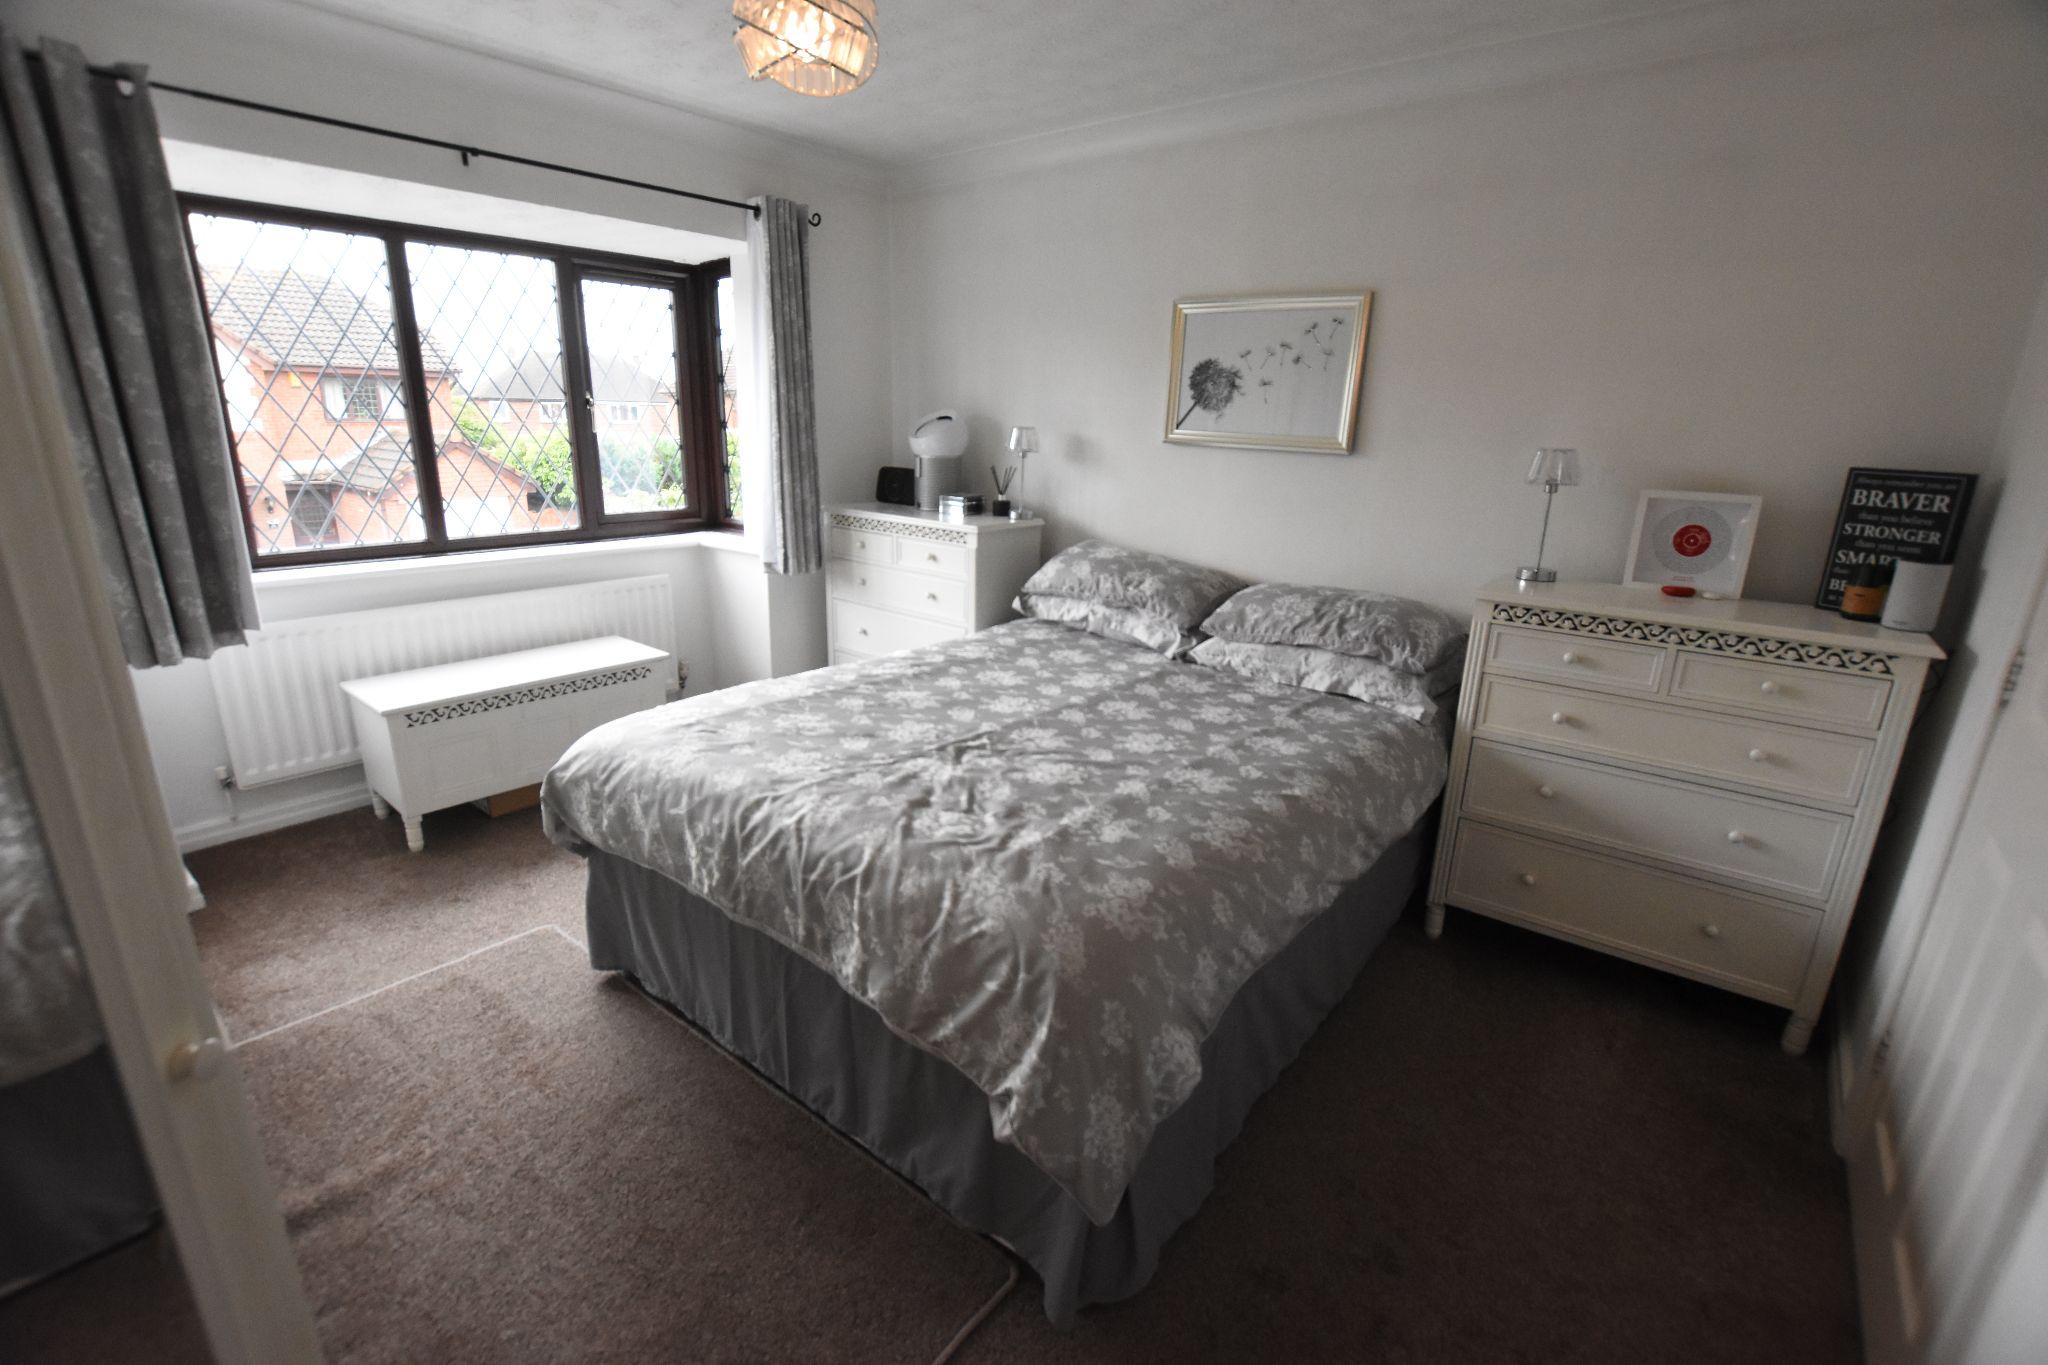 3 bedroom detached house Sold STC in Preston - Bedroom 1